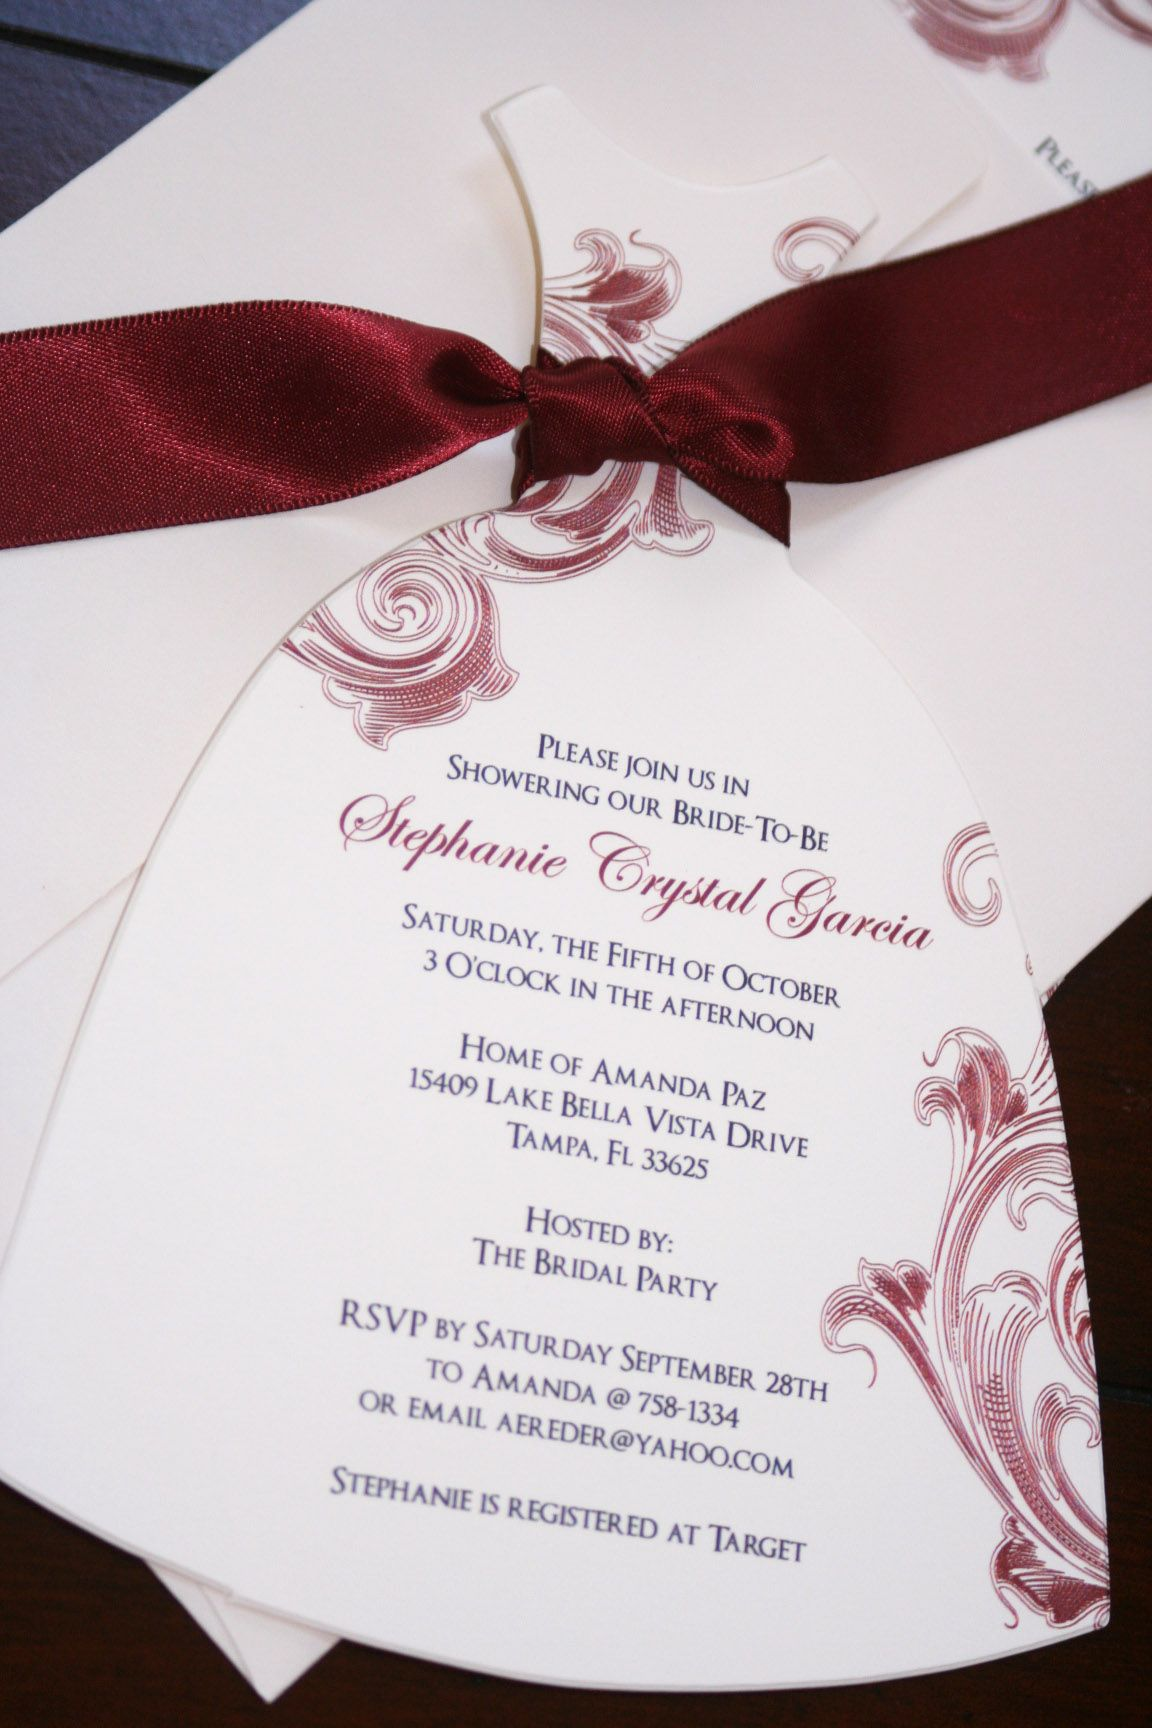 wedding dress bridal shower invitations cool Wedding Dress Bridal – Wedding Dress Shower Invitations